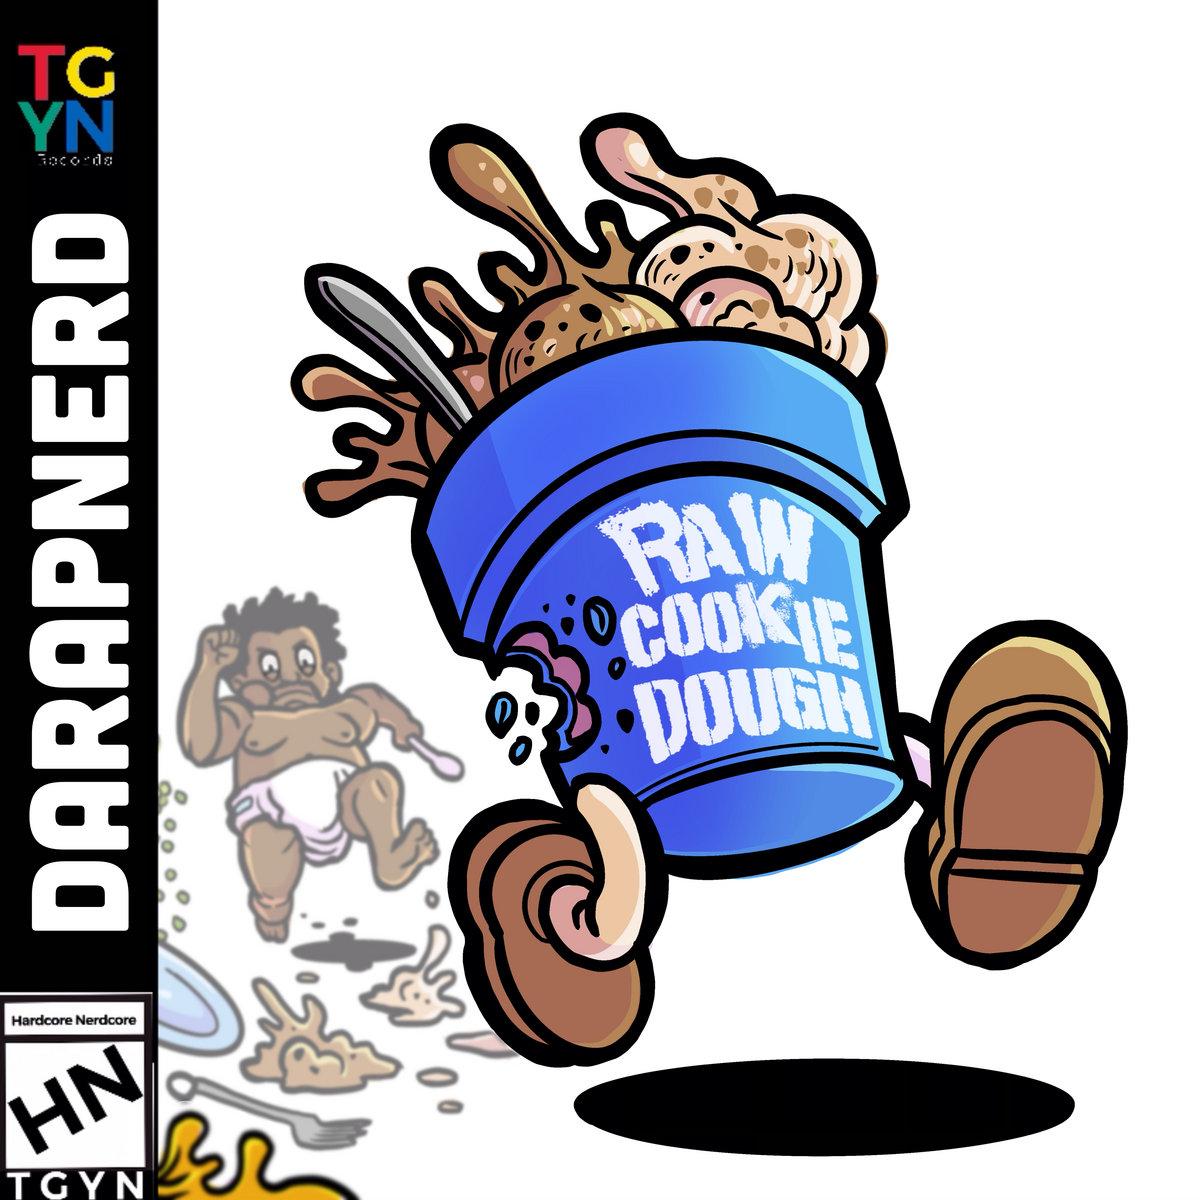 Review: Da Rap Nerd – Raw Cookie Dough